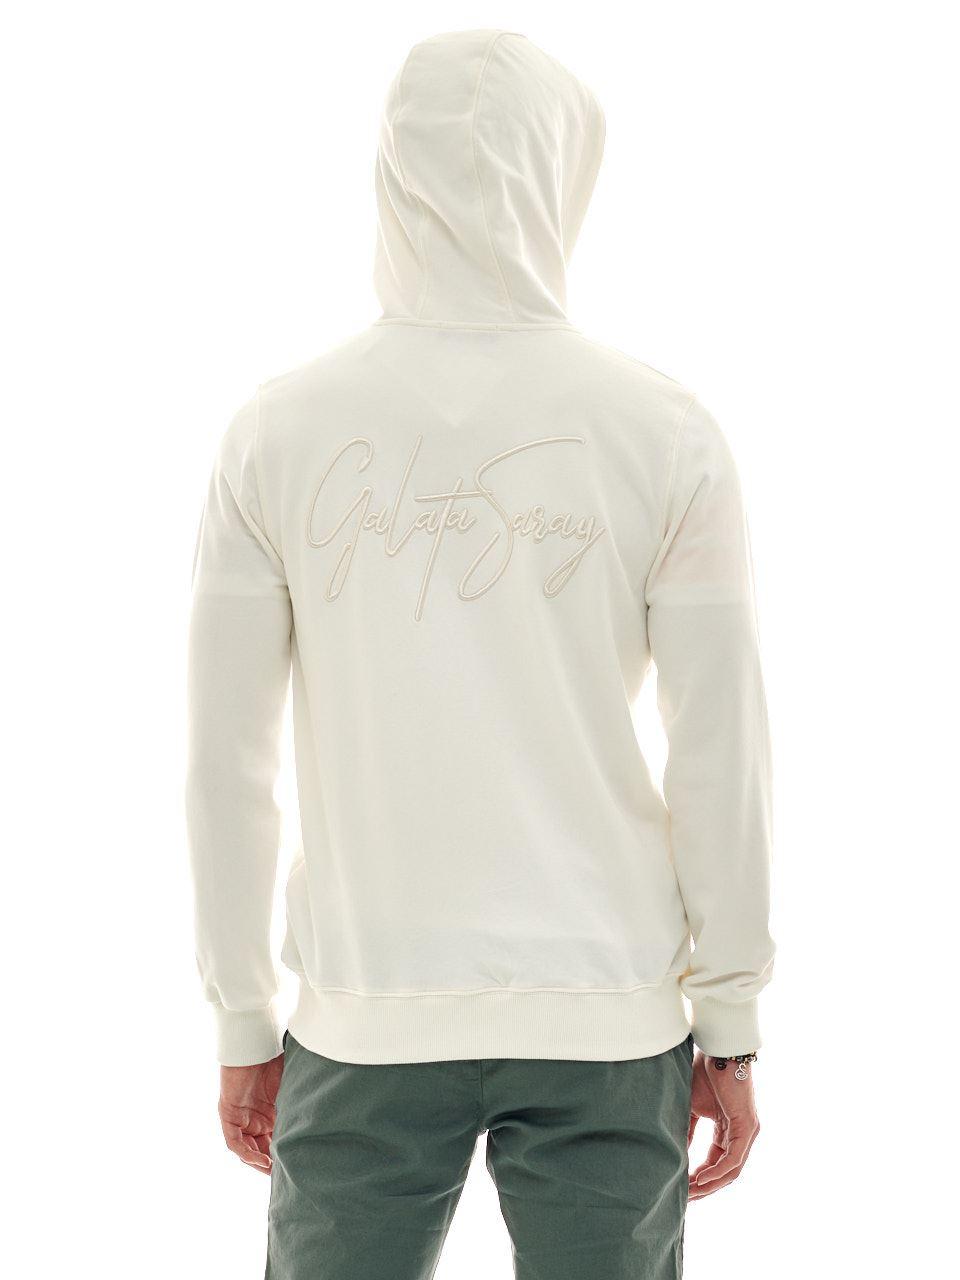 Galatasaray Forever Erkek Sweatshirt E211089